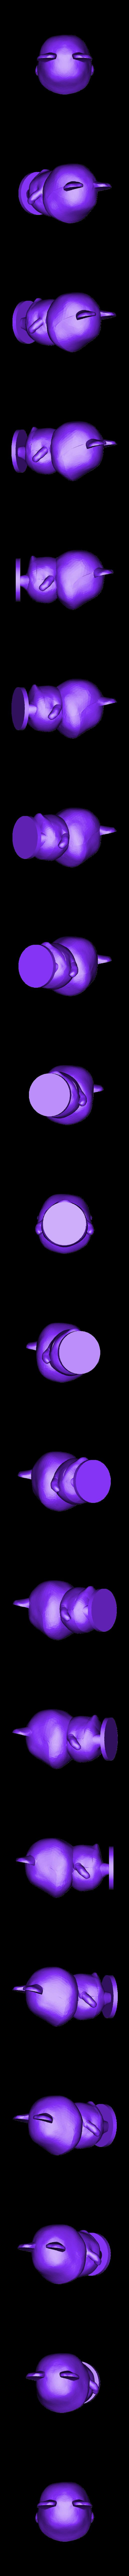 hamphrey full.stl Download free STL file Hamster - Animal Crossing • Object to 3D print, skelei